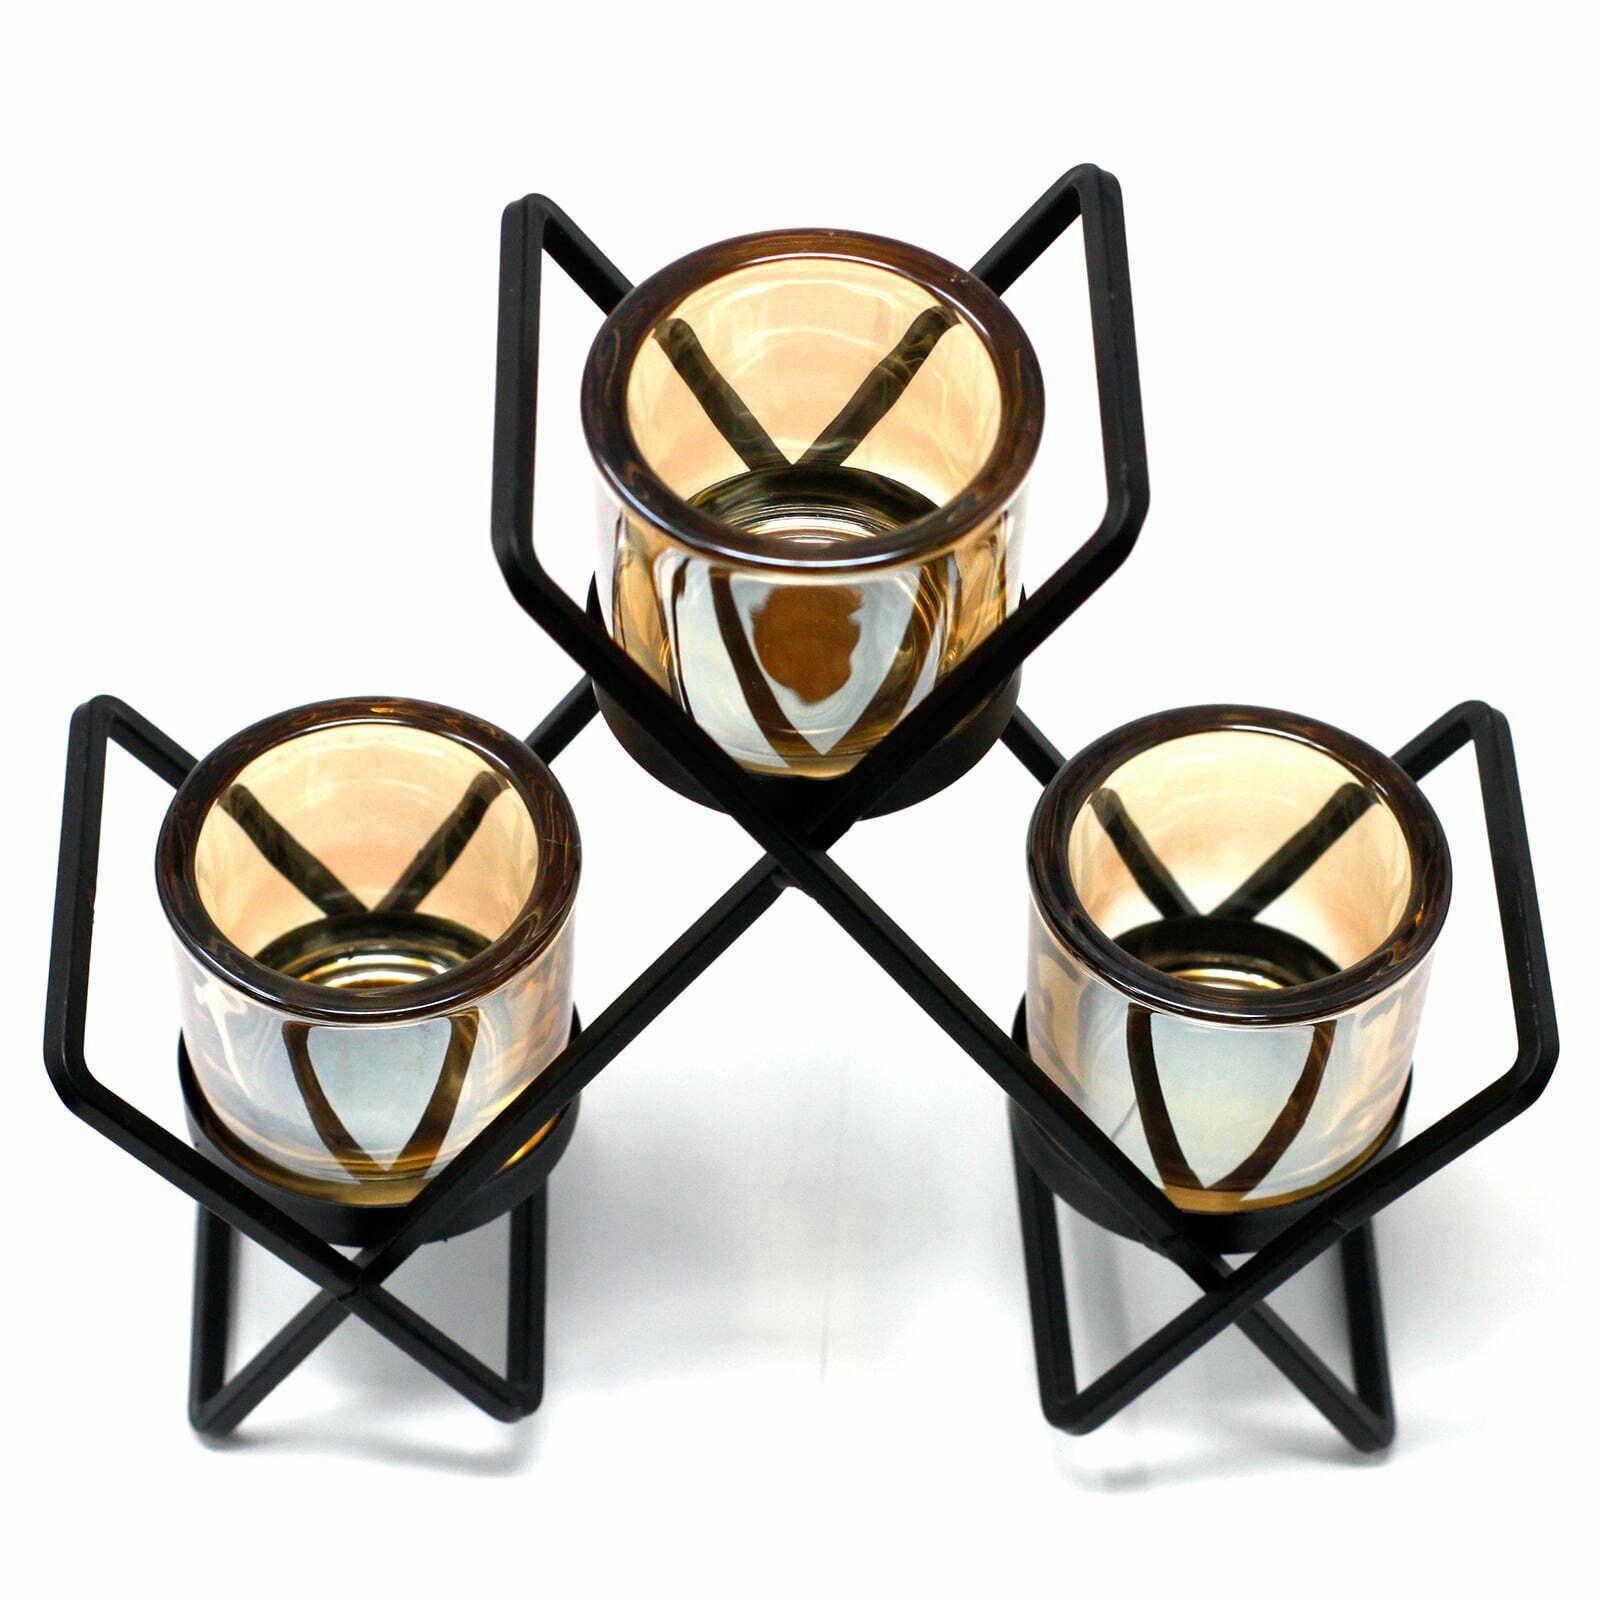 Candelabro de Ferro – Triângulo- 3 Velas